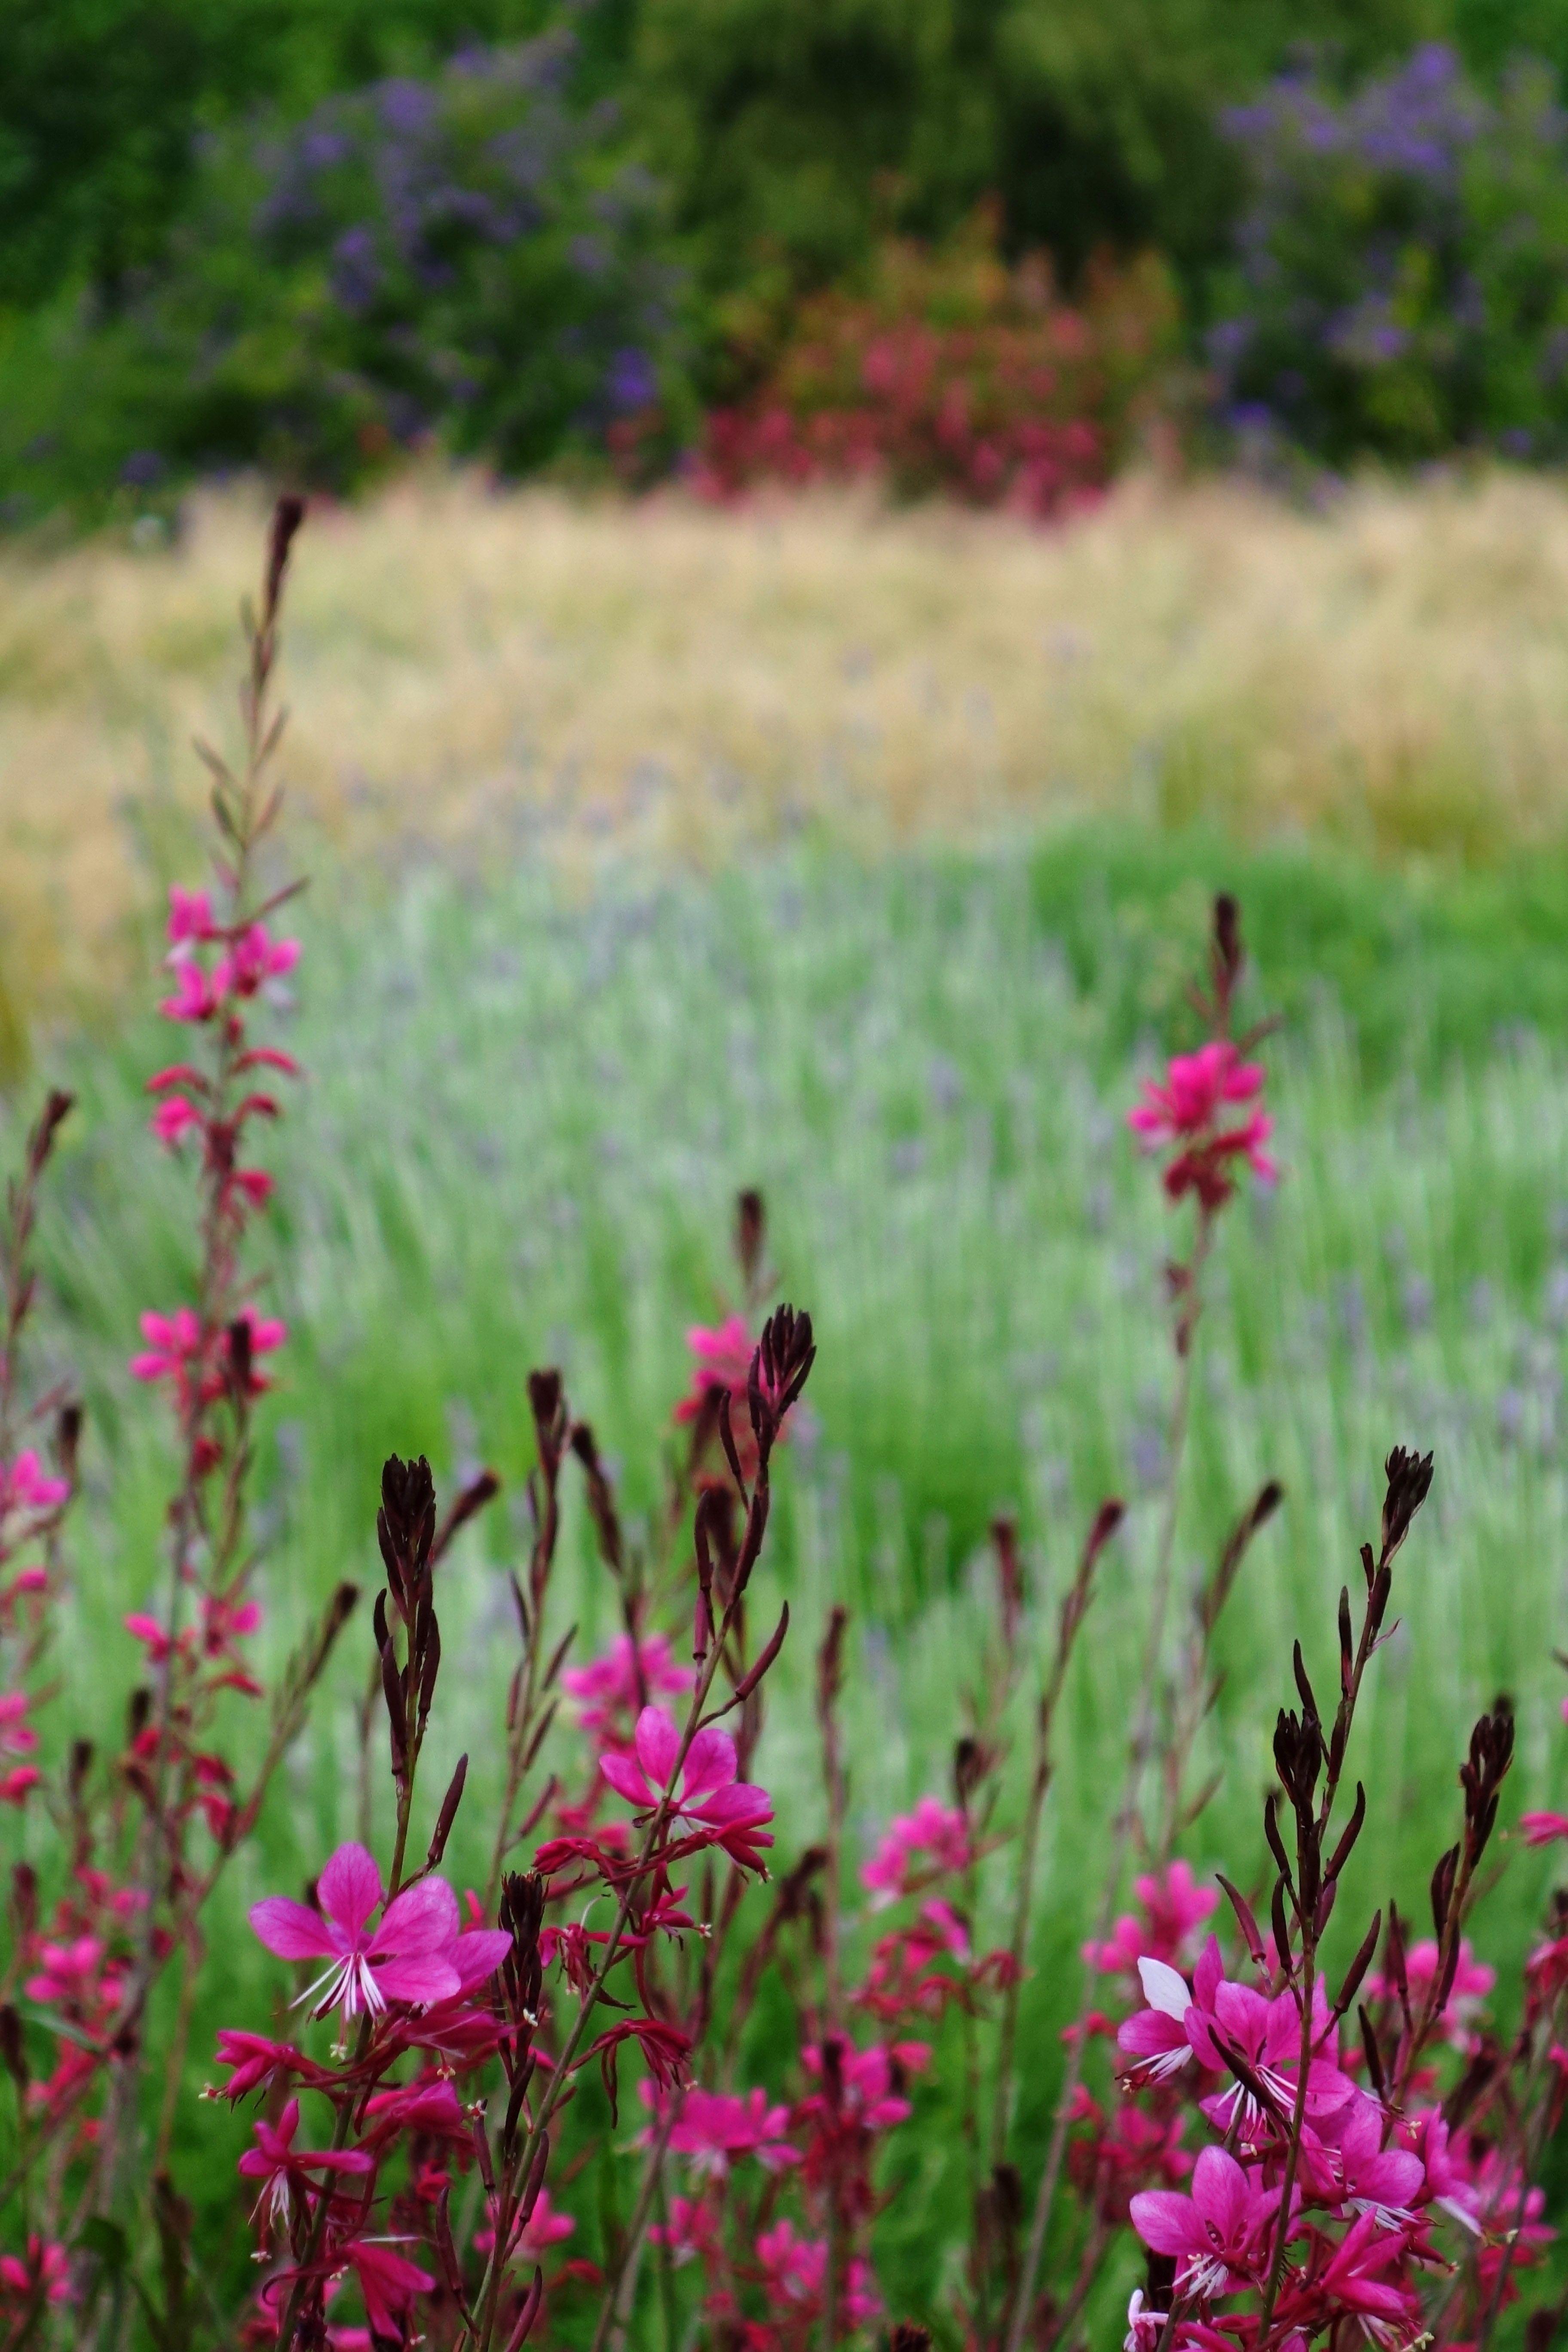 Pink gaura a lovely mediterranean flower joey pinterest pink gaura a lovely mediterranean flower mightylinksfo